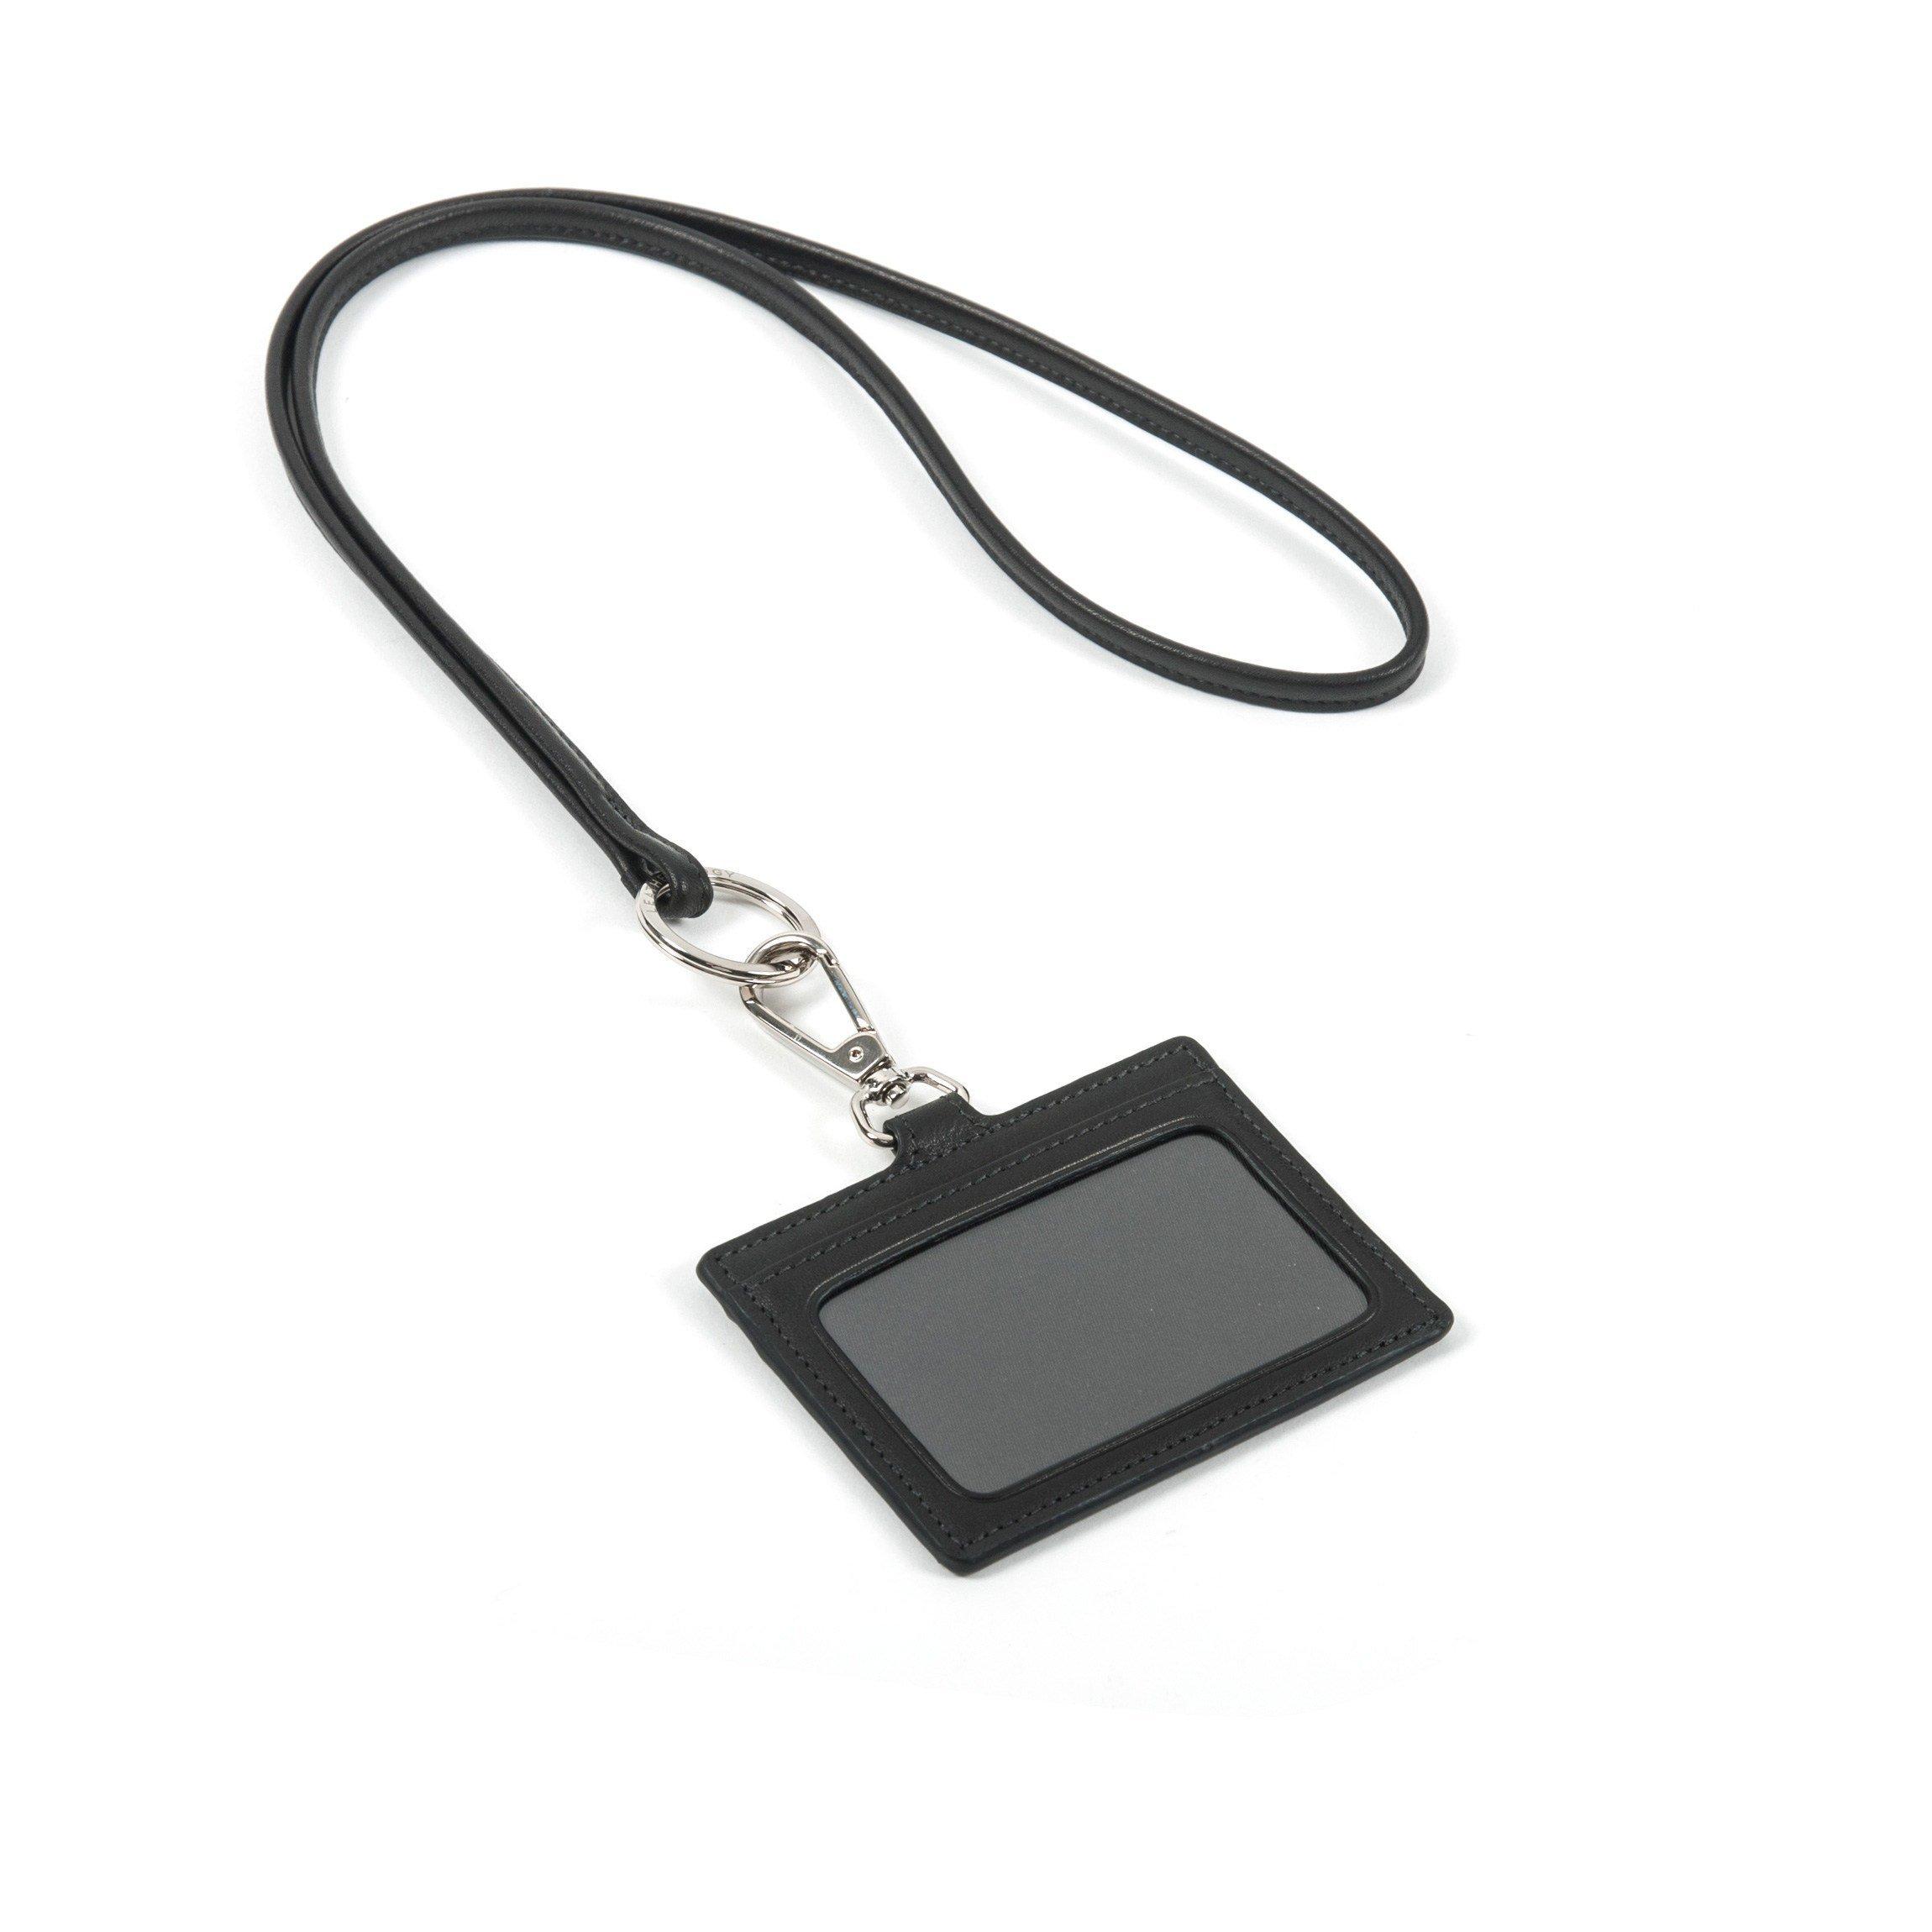 Horizontal Lanyard - Full Grain Leather - Black Onyx (black)